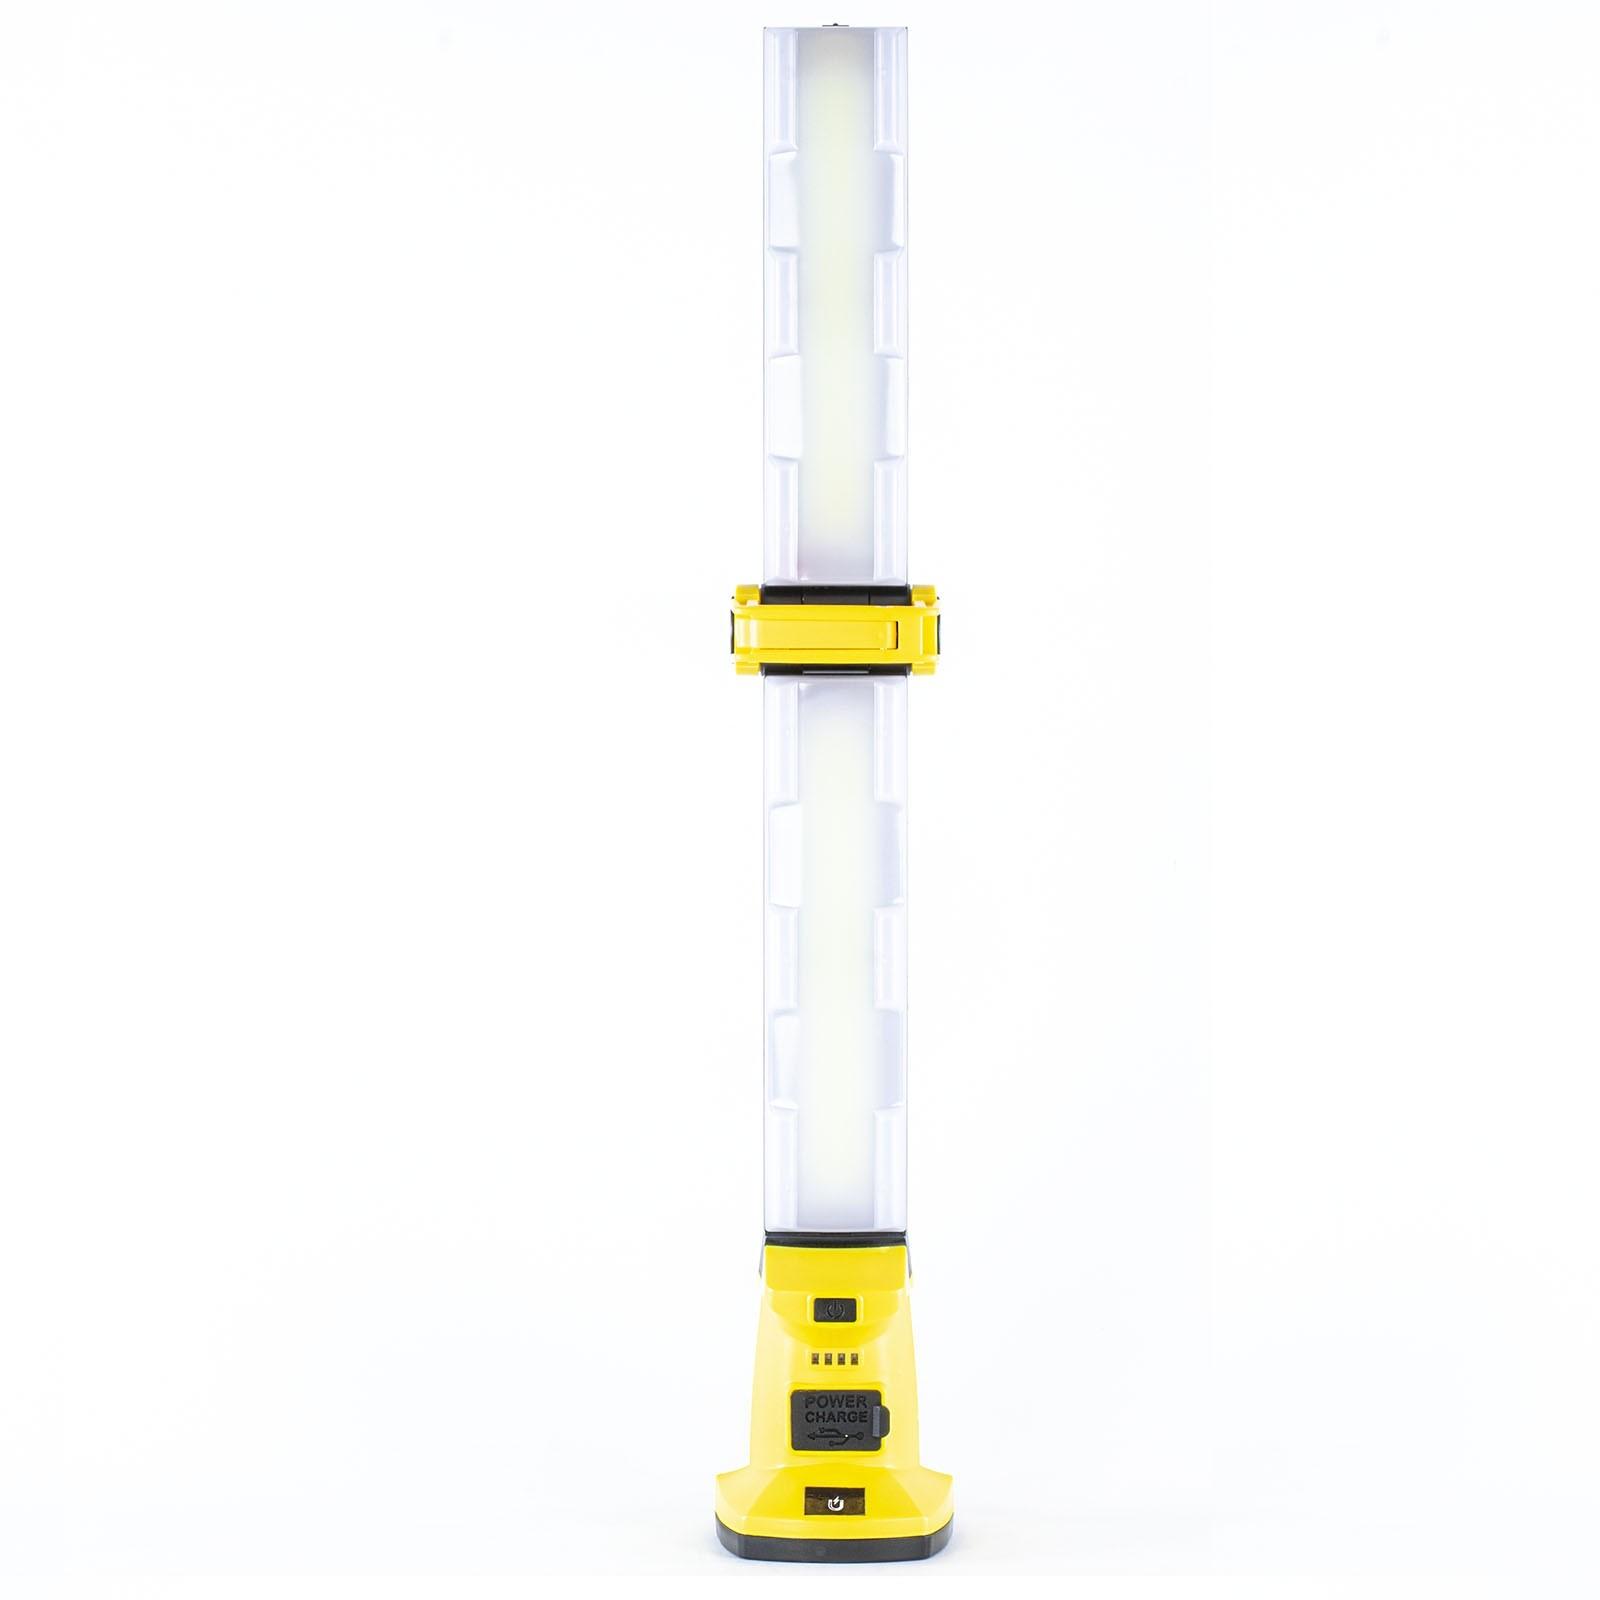 1300 Lumen USB Rechargeable Foldable Work Light